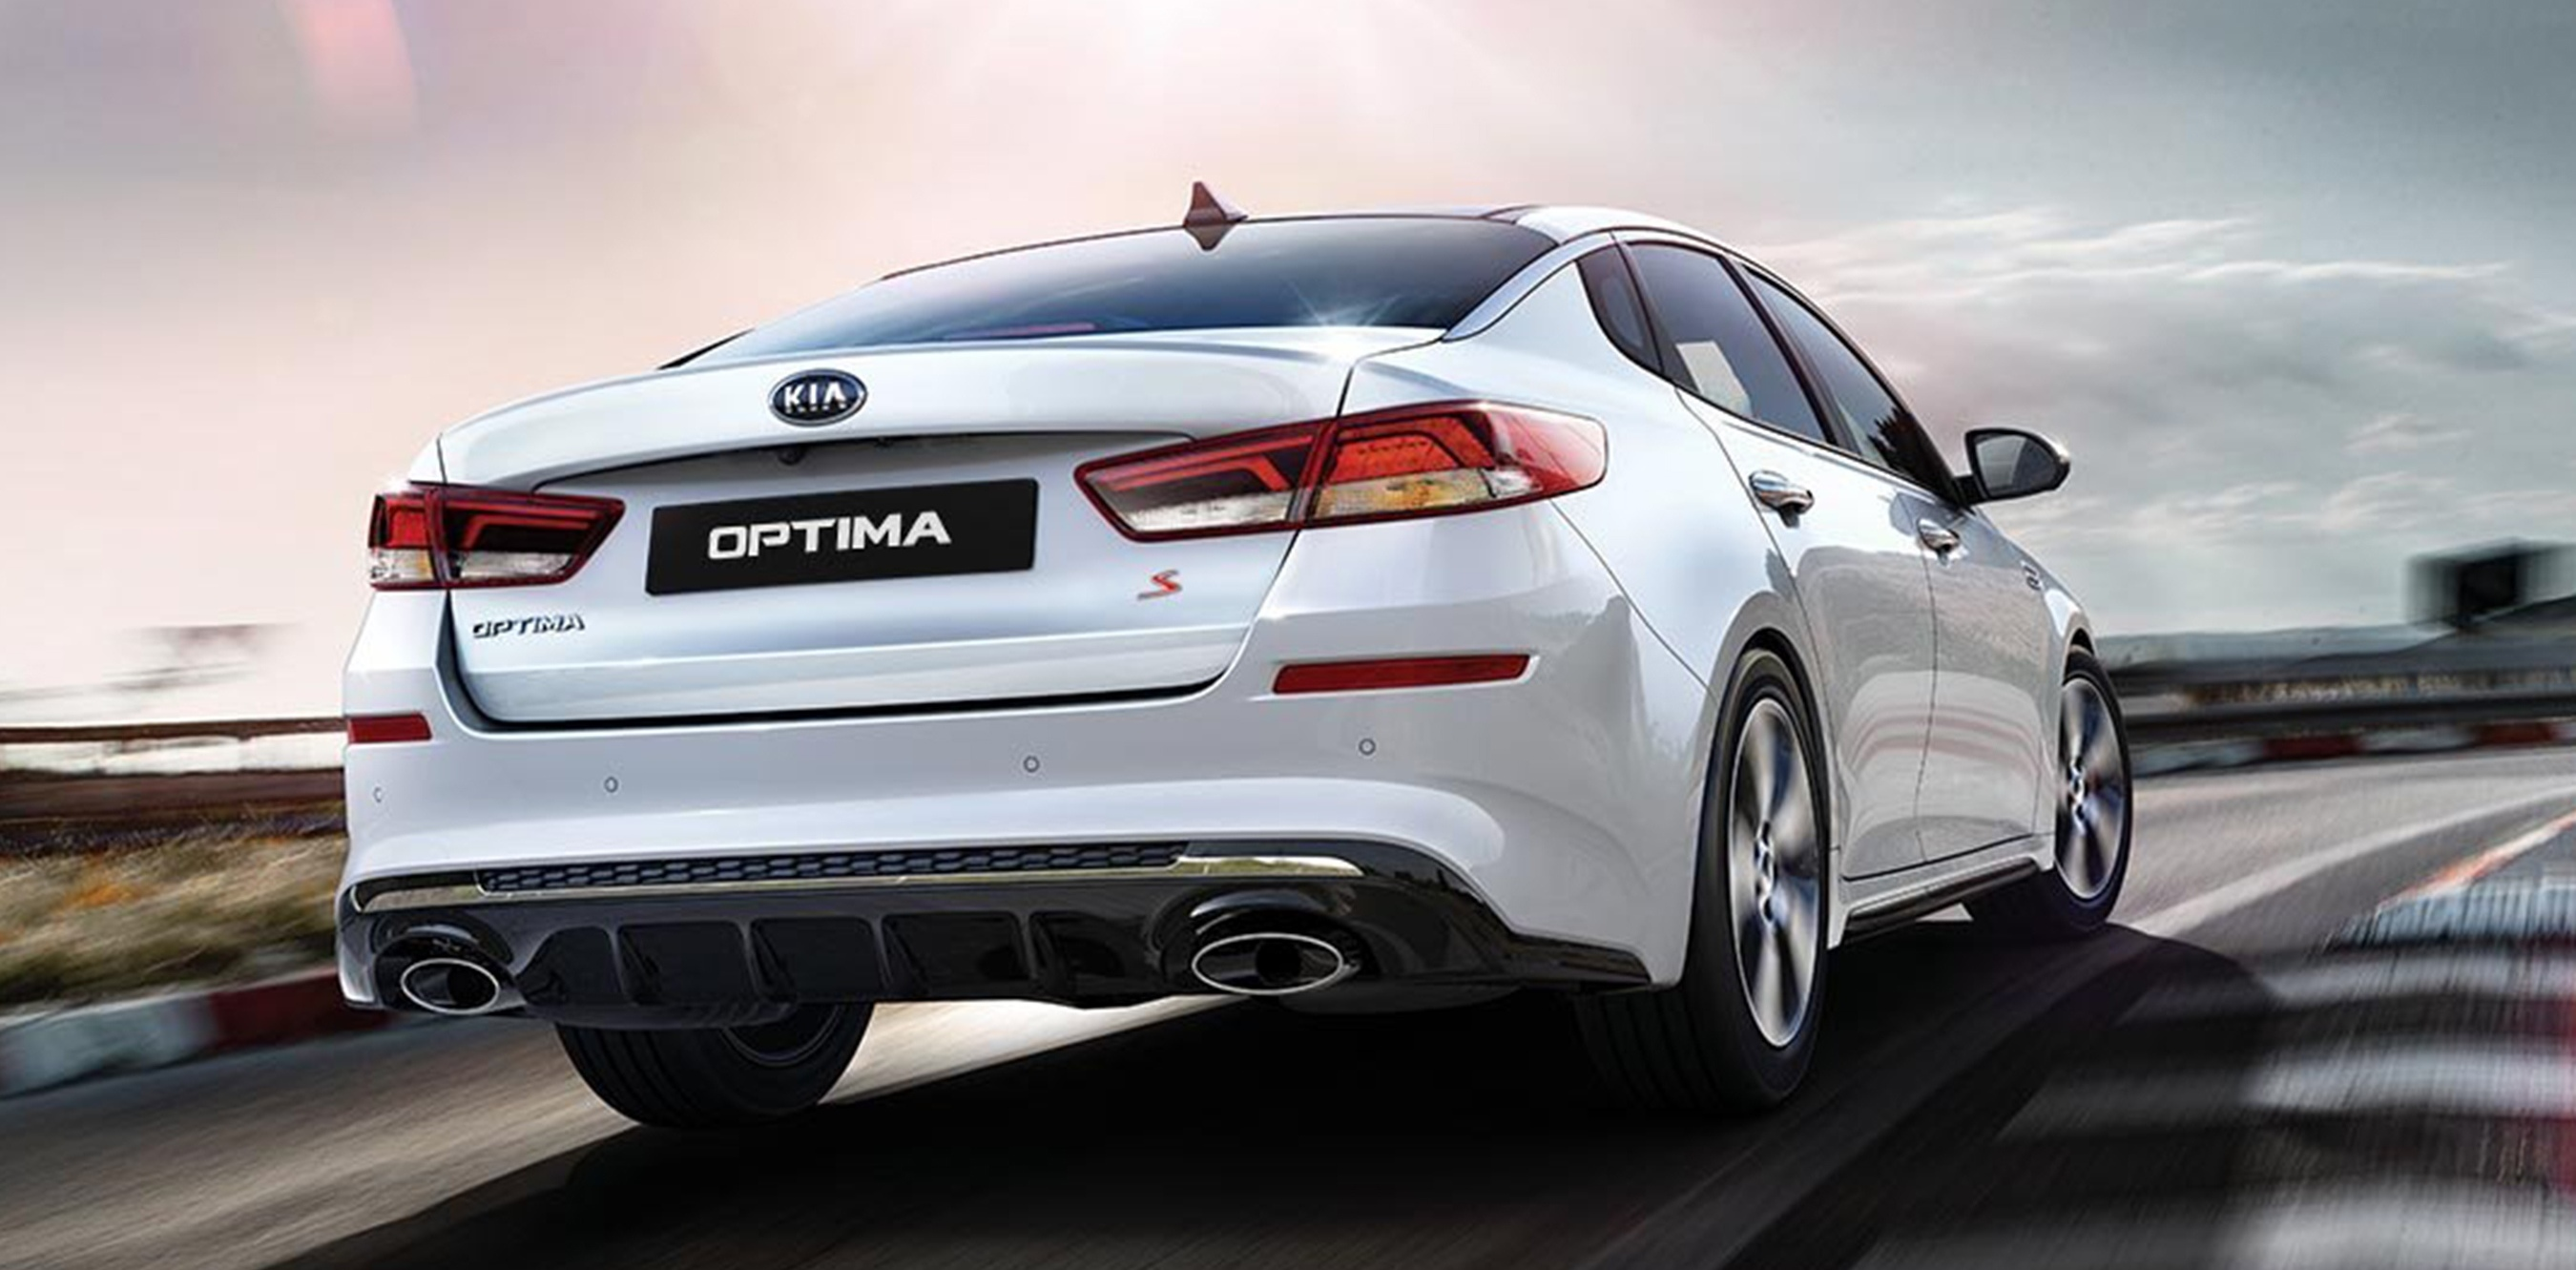 Used Kia Optima for Sale in Bangor, ME